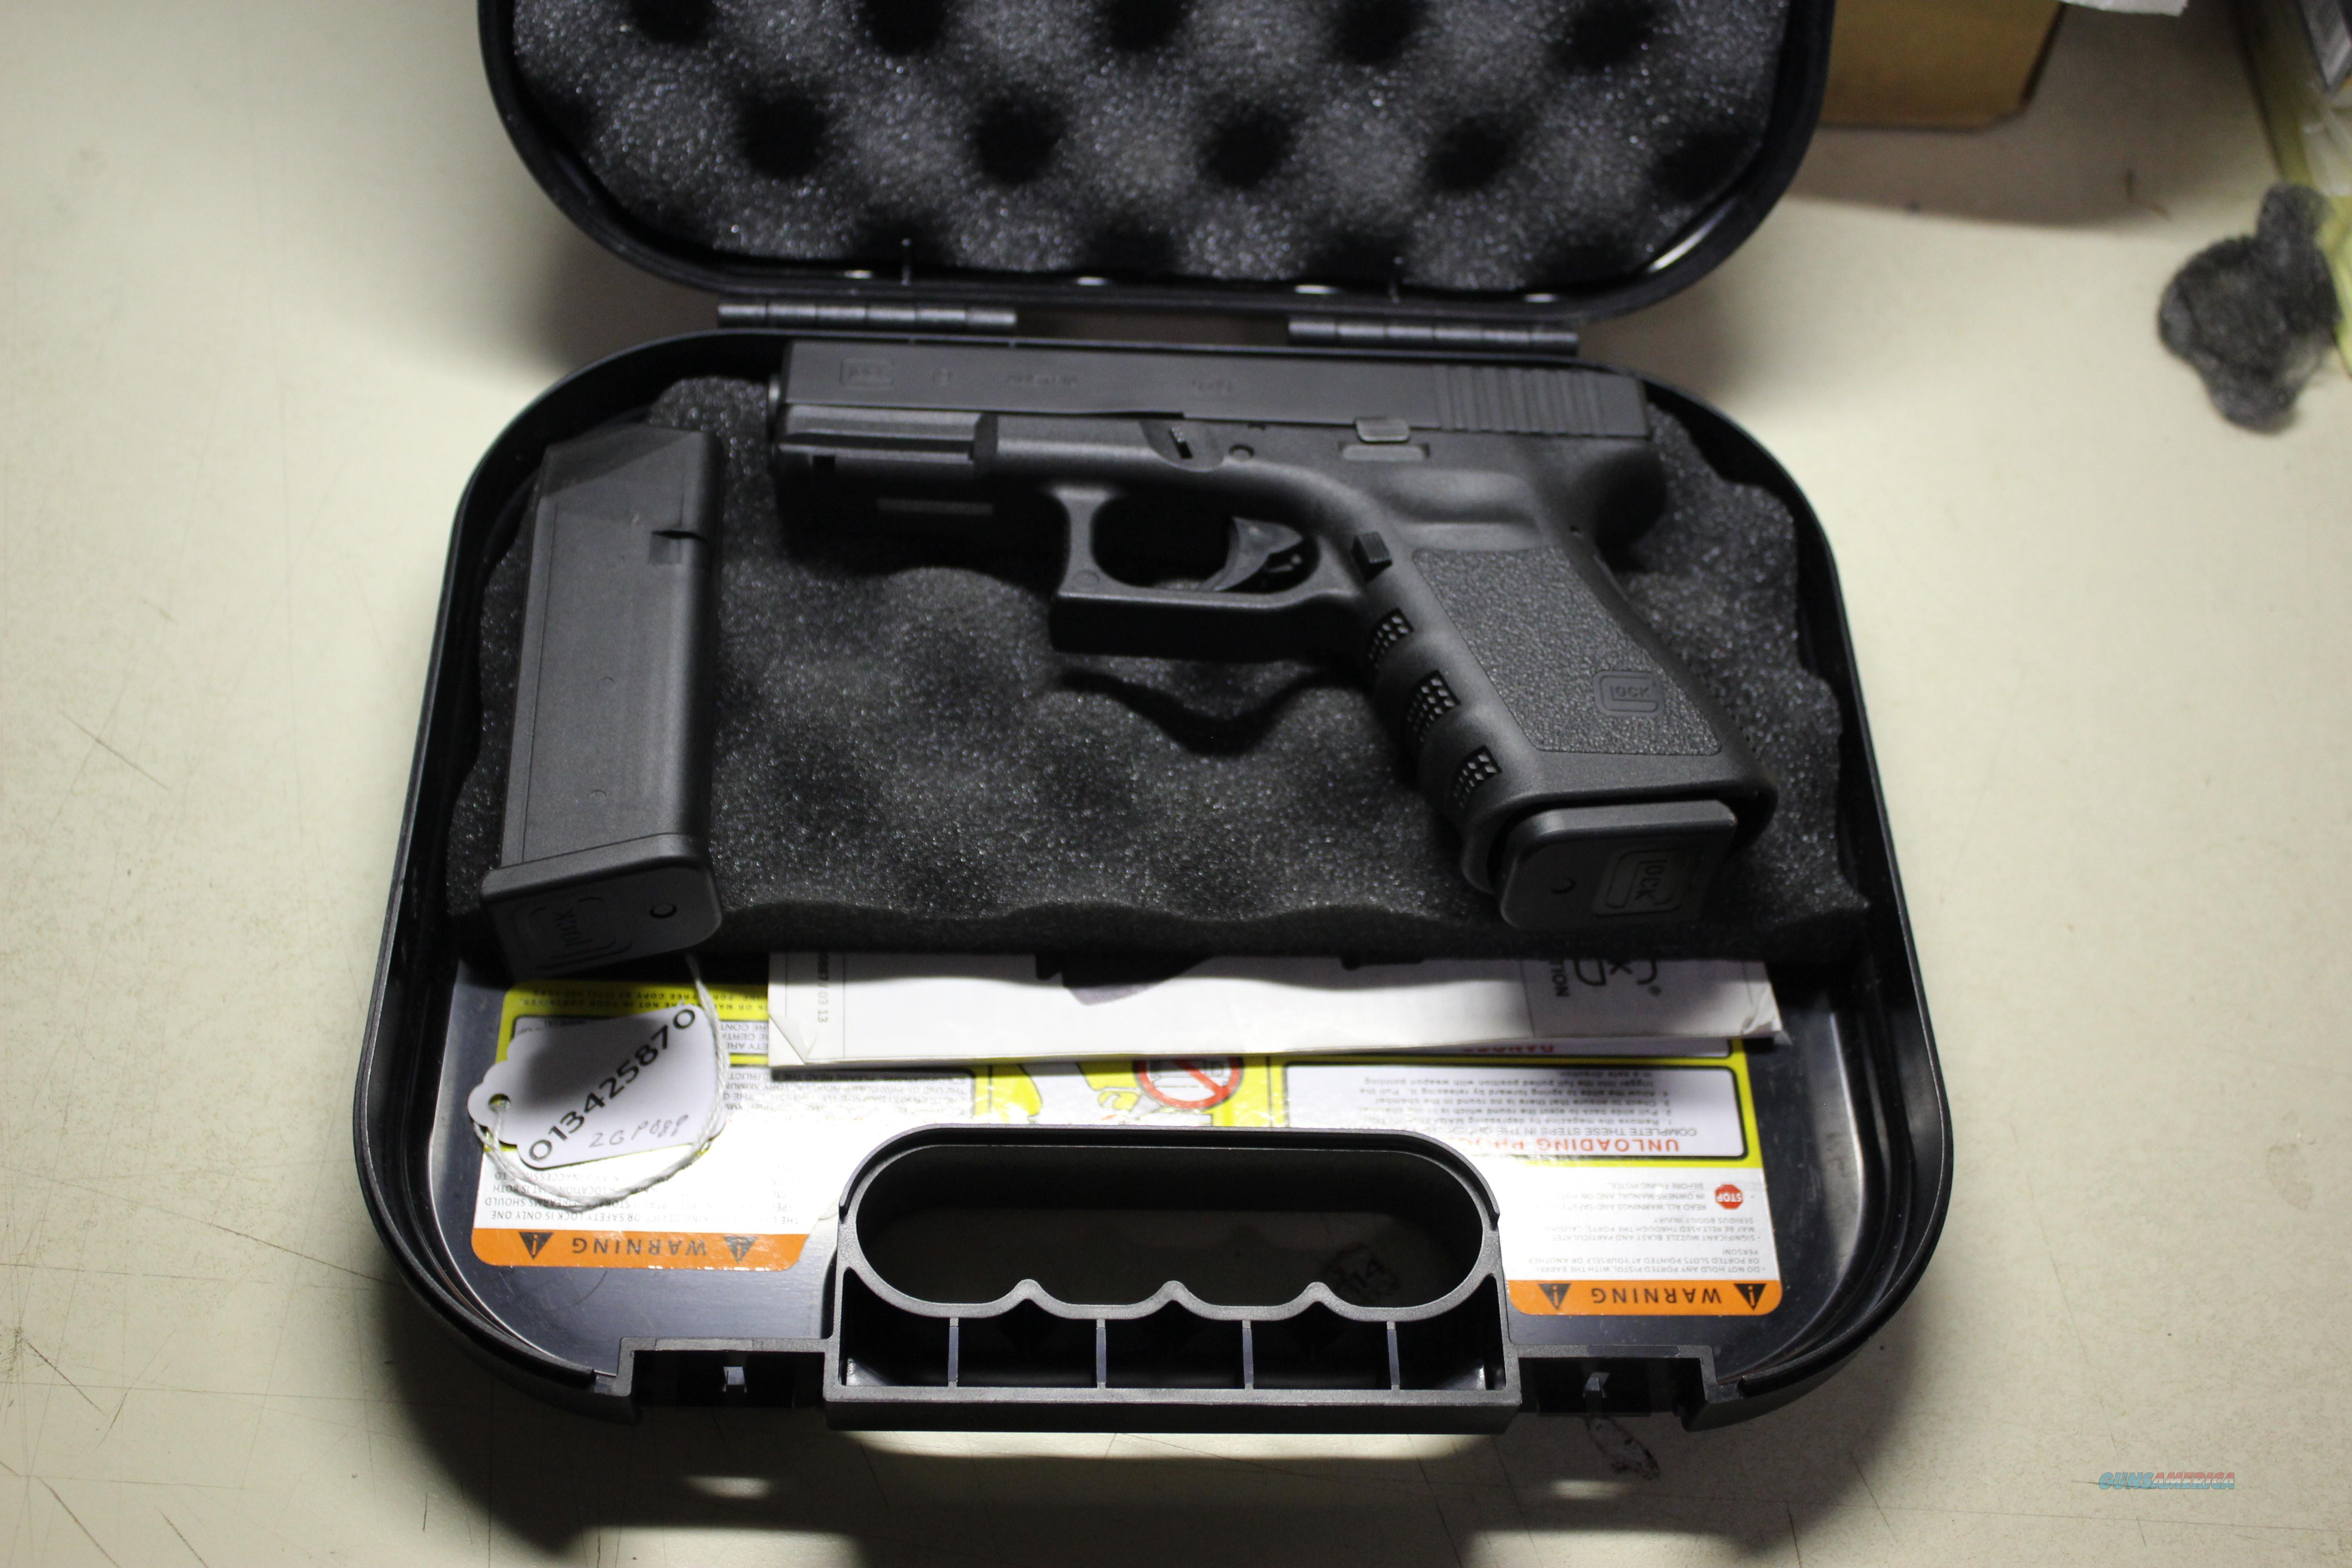 GLOCK 19 GEN 3  Guns > Pistols > Glock Pistols > 19/19X